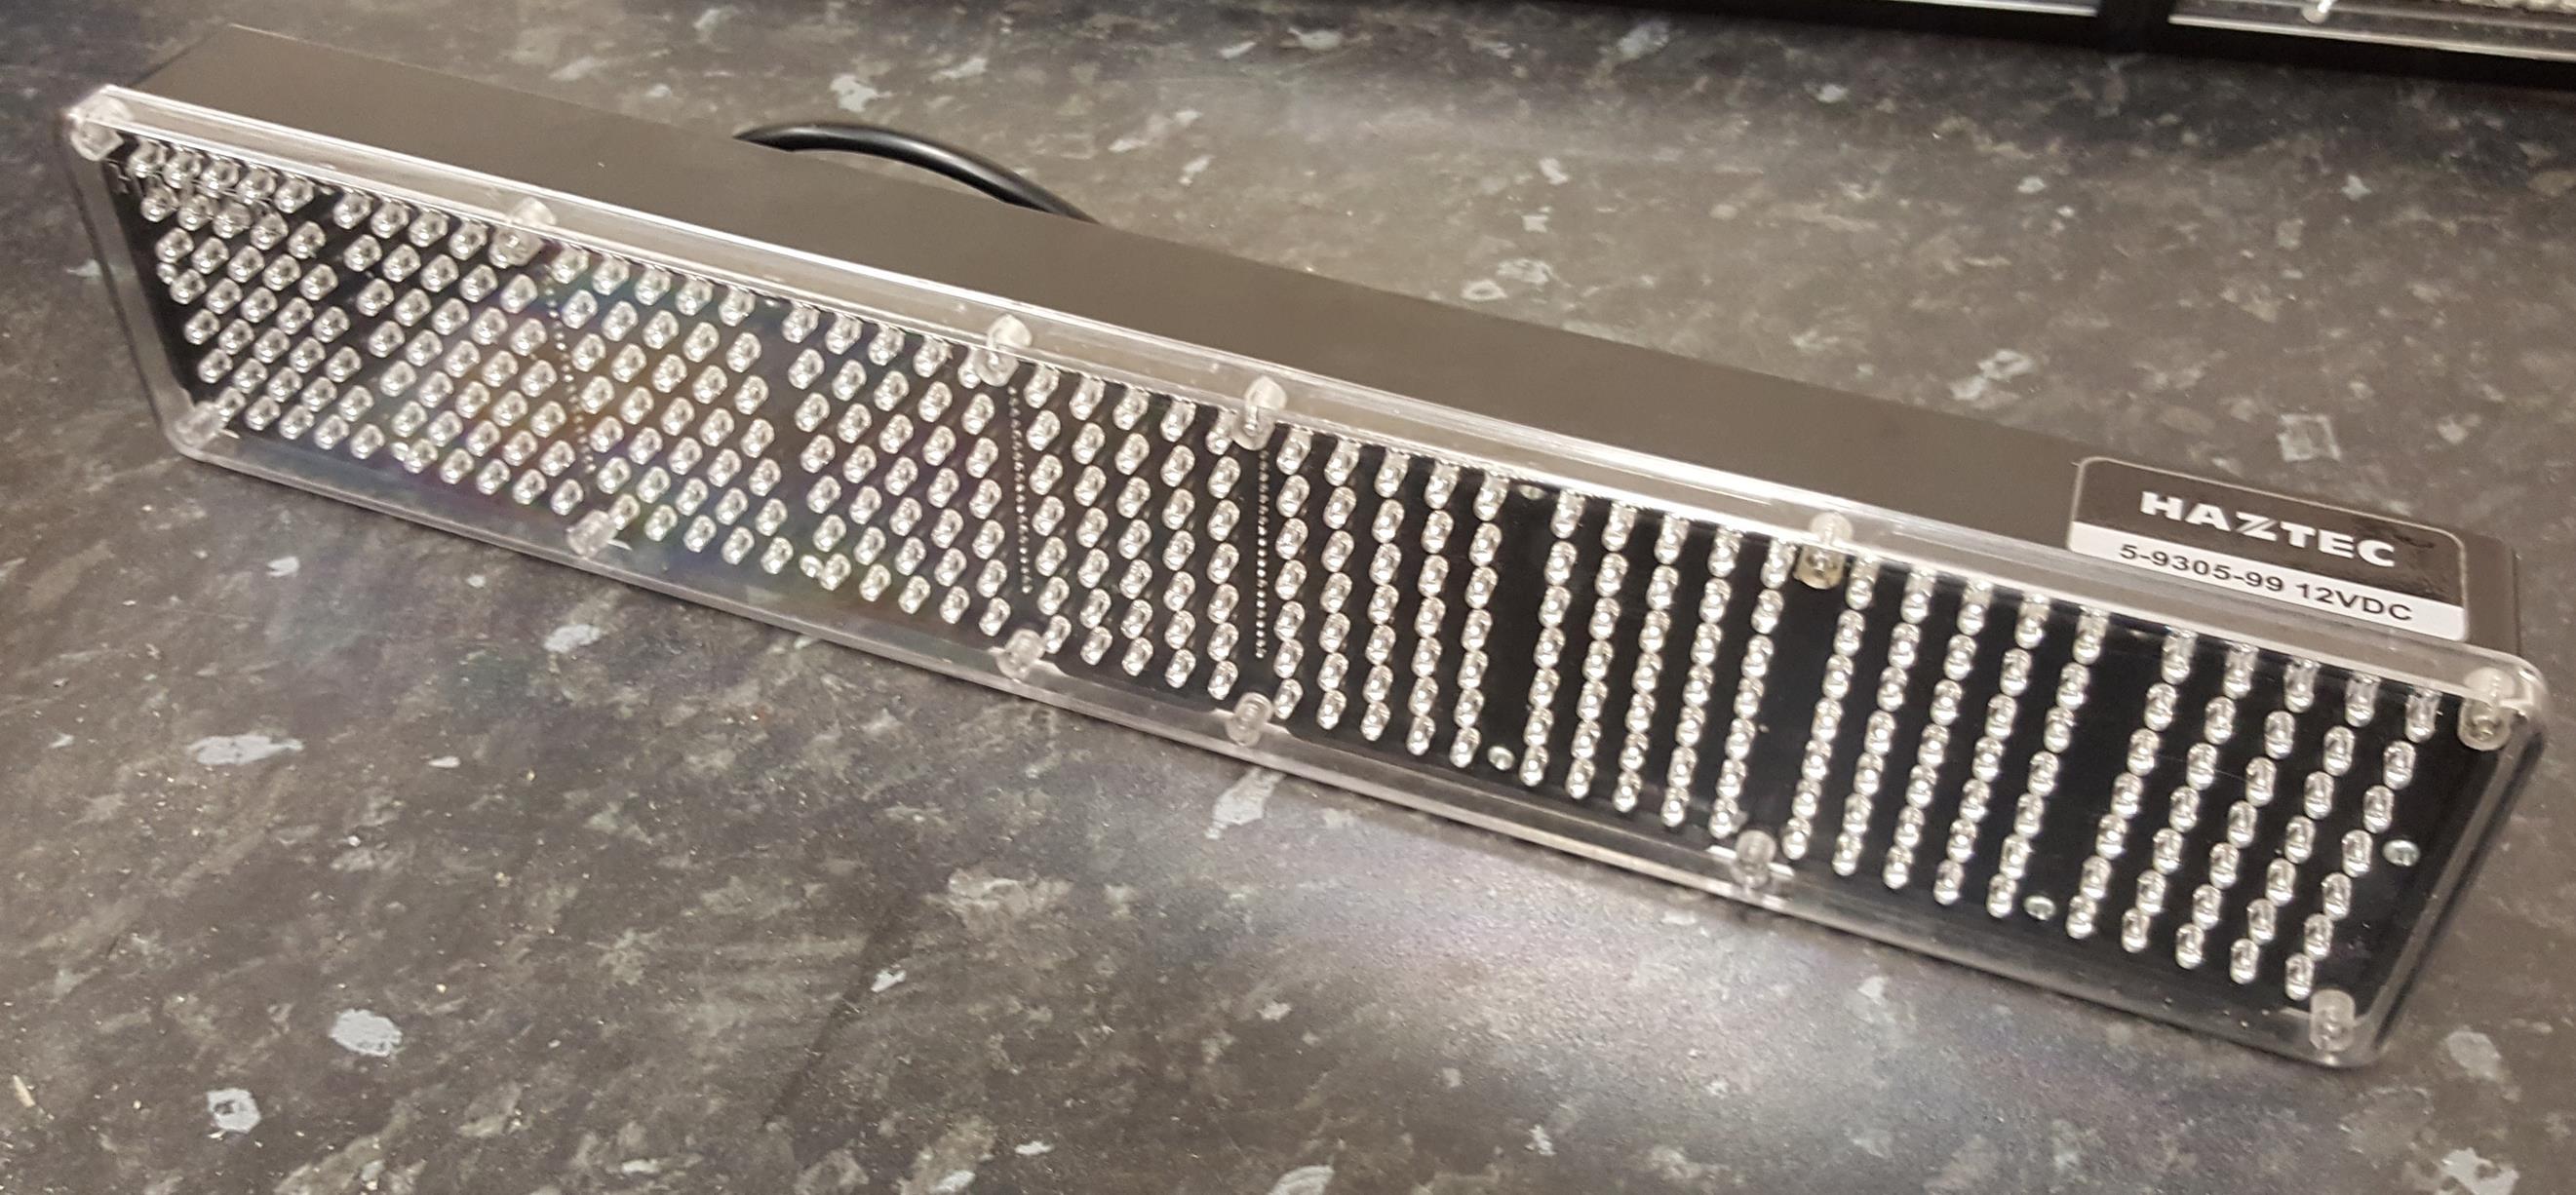 Haztec 464mm LED message display